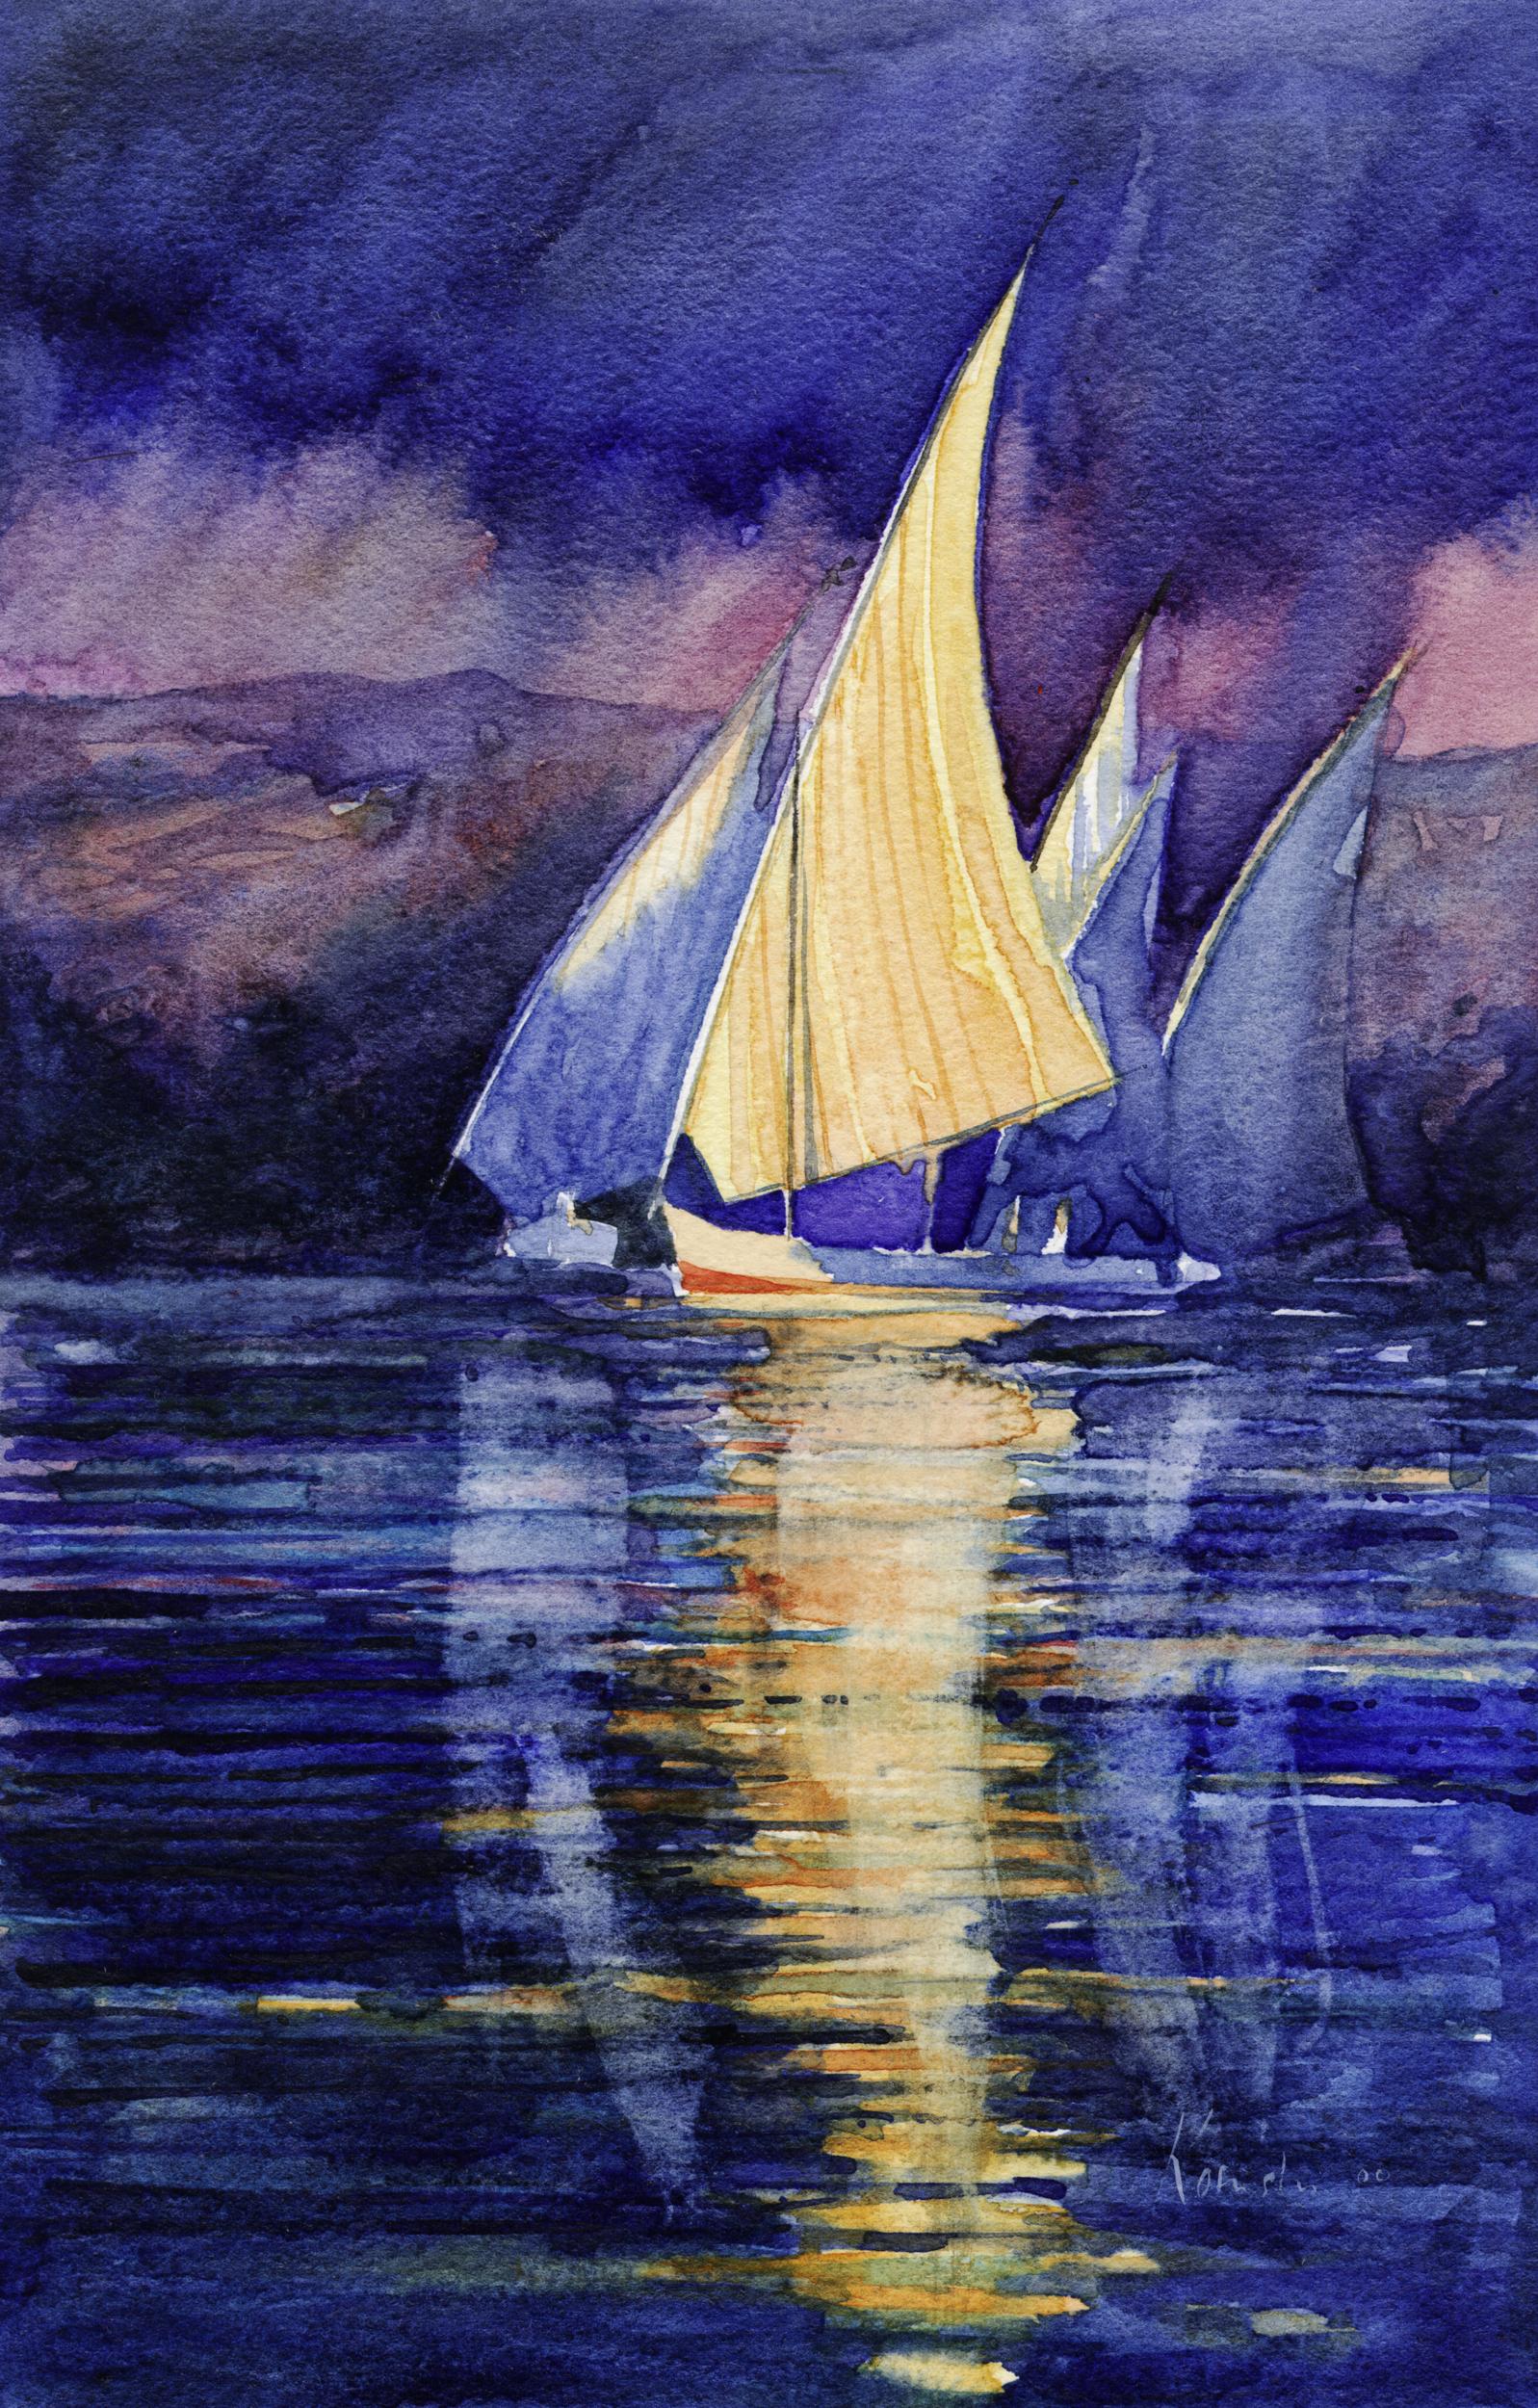 Felucha on the Nile